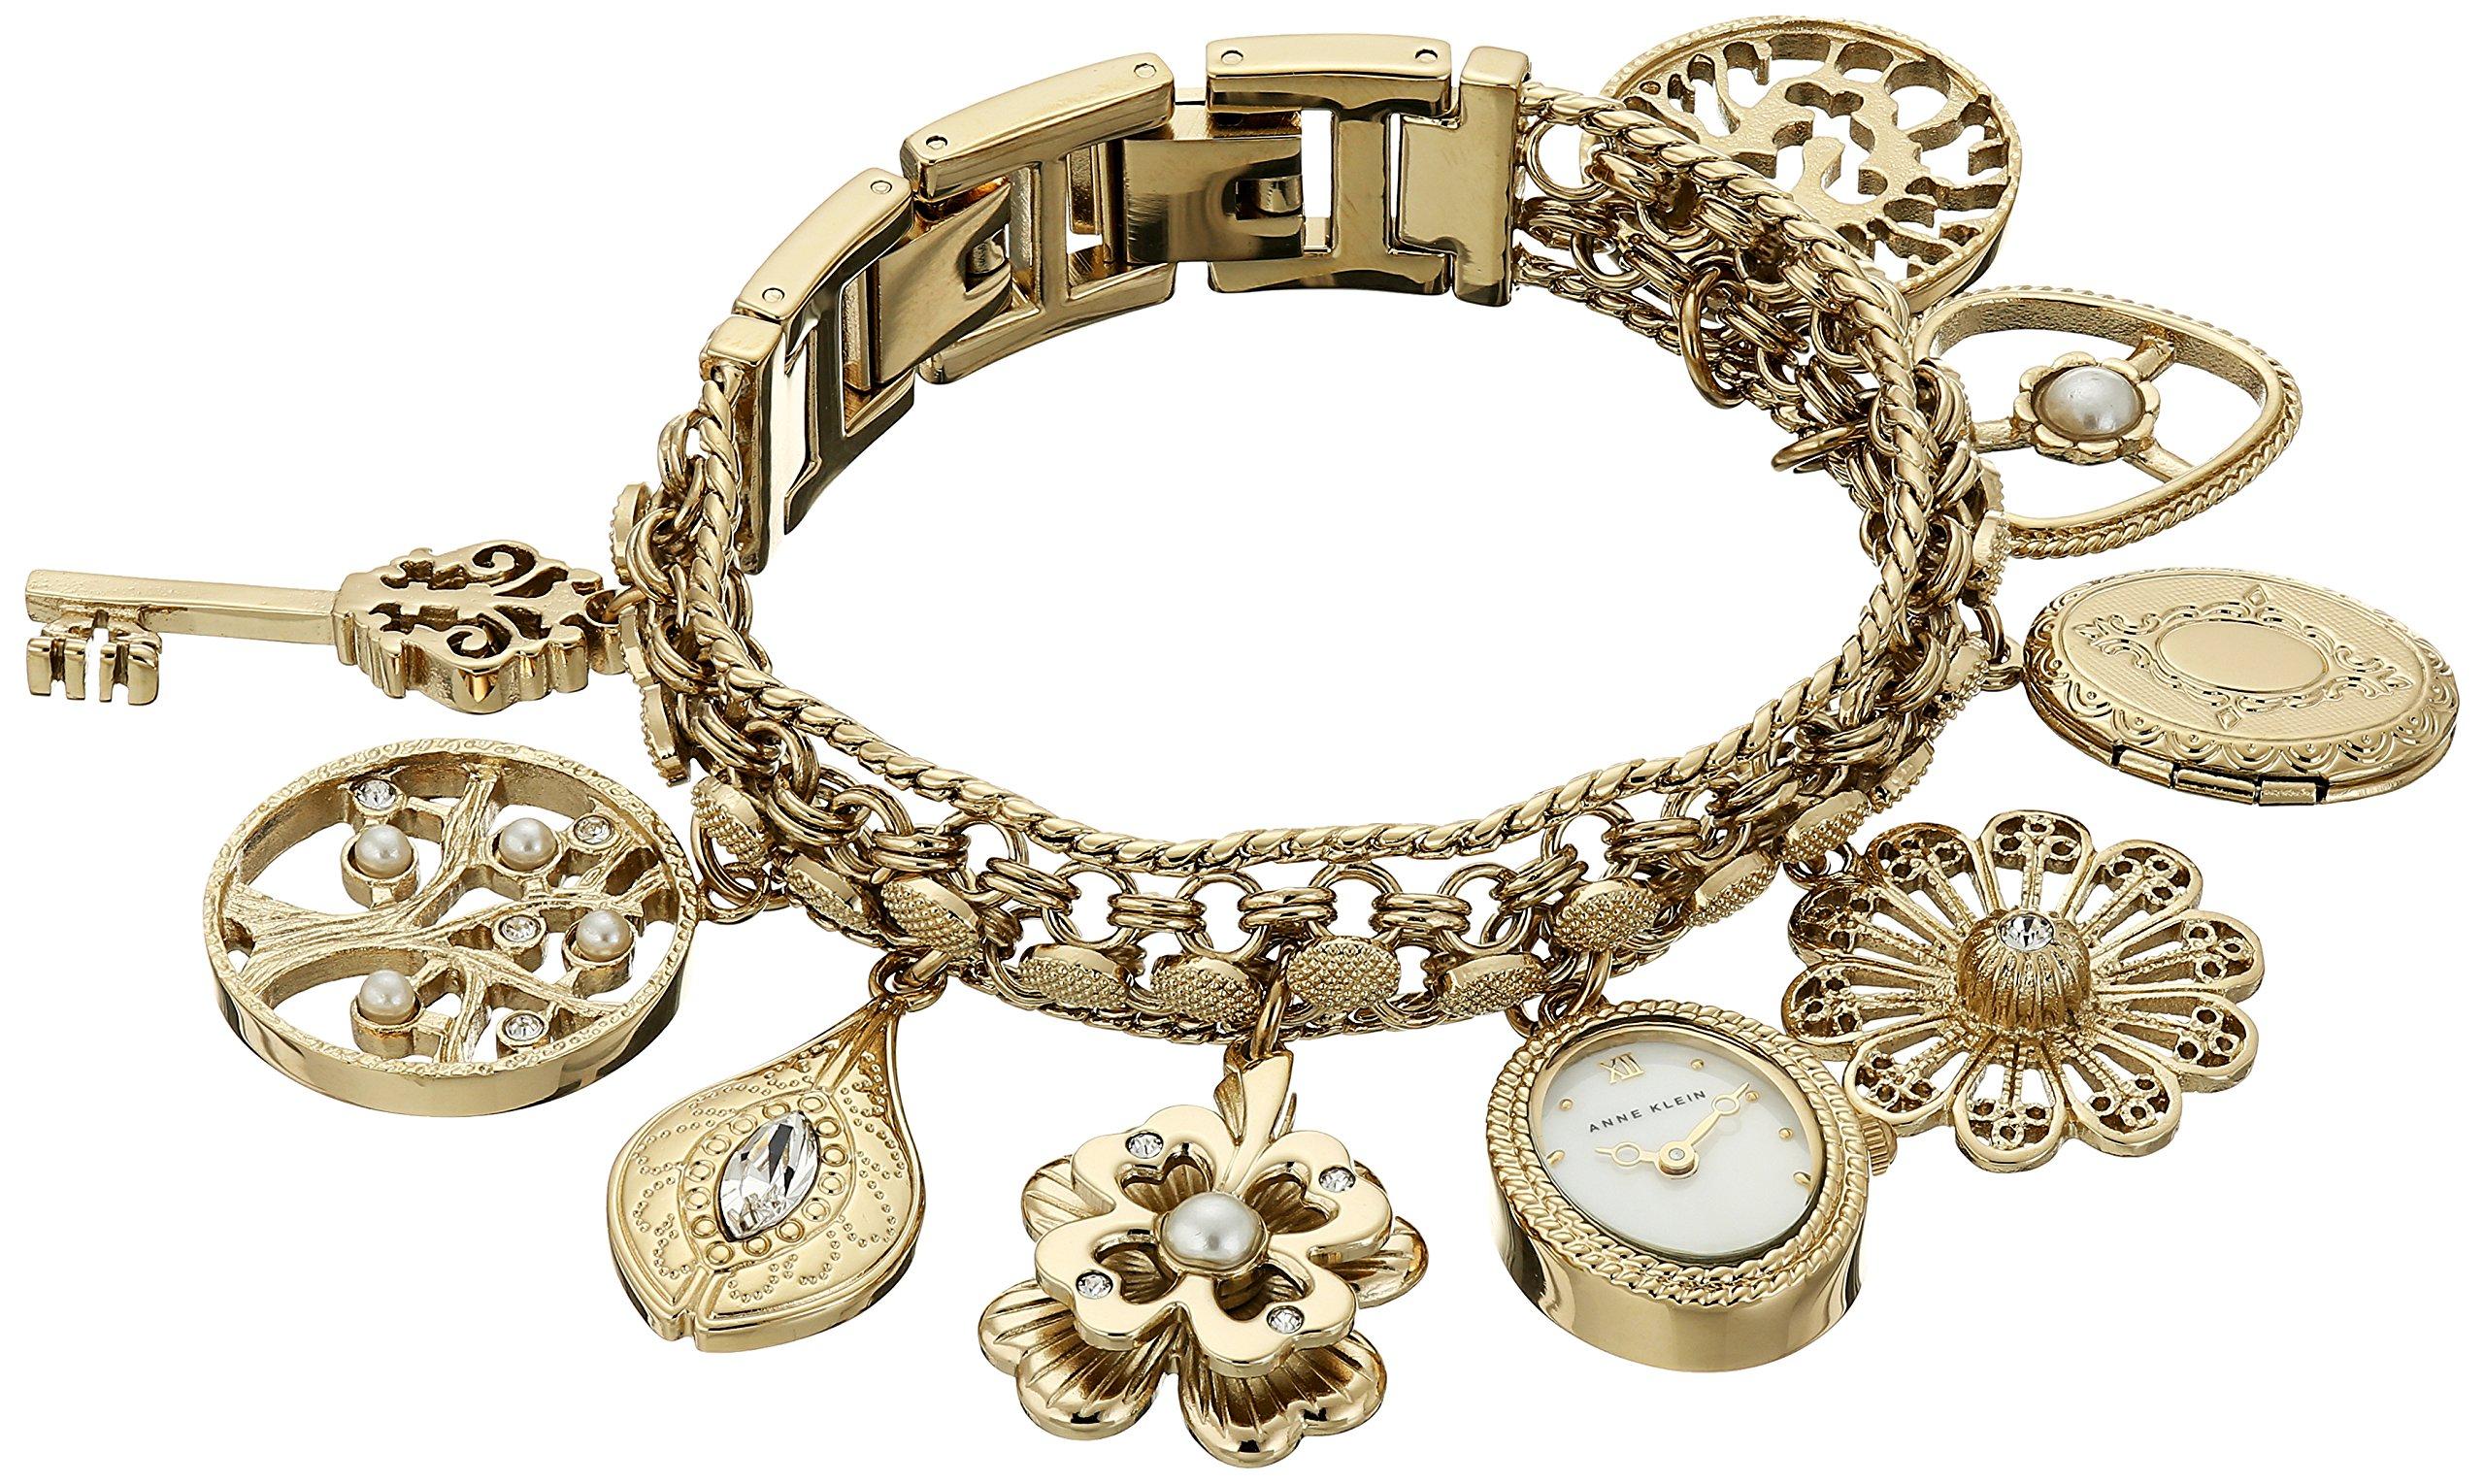 Anne Klein Women's  10-8096CHRM Swarovski Crystal Accented Gold-Tone Charm Bracelet Watch by Anne Klein